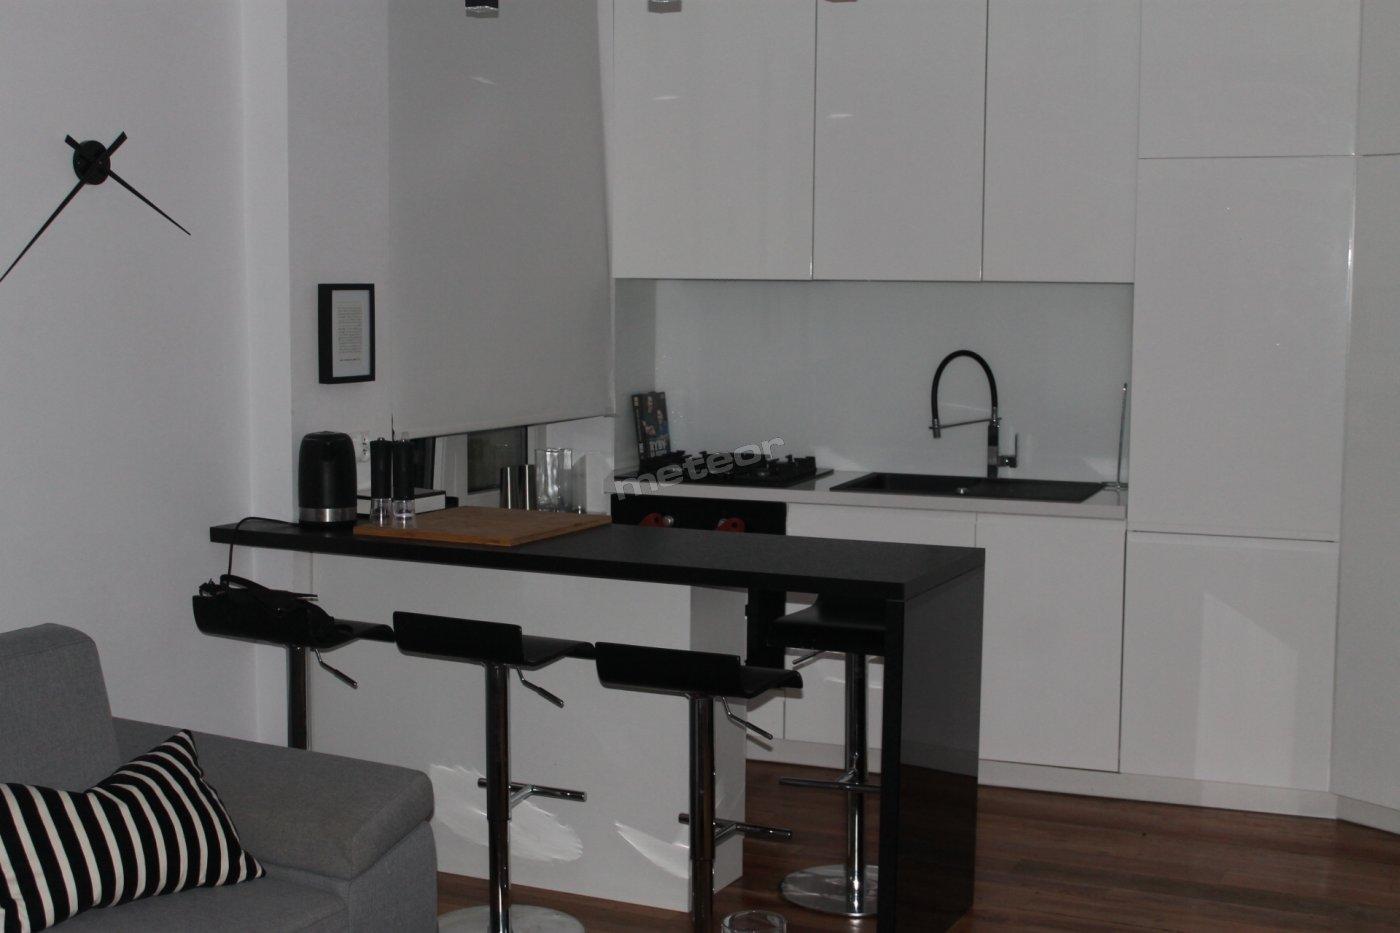 Apartament Karlikowska Sopot - kontakt, telefon, ceny